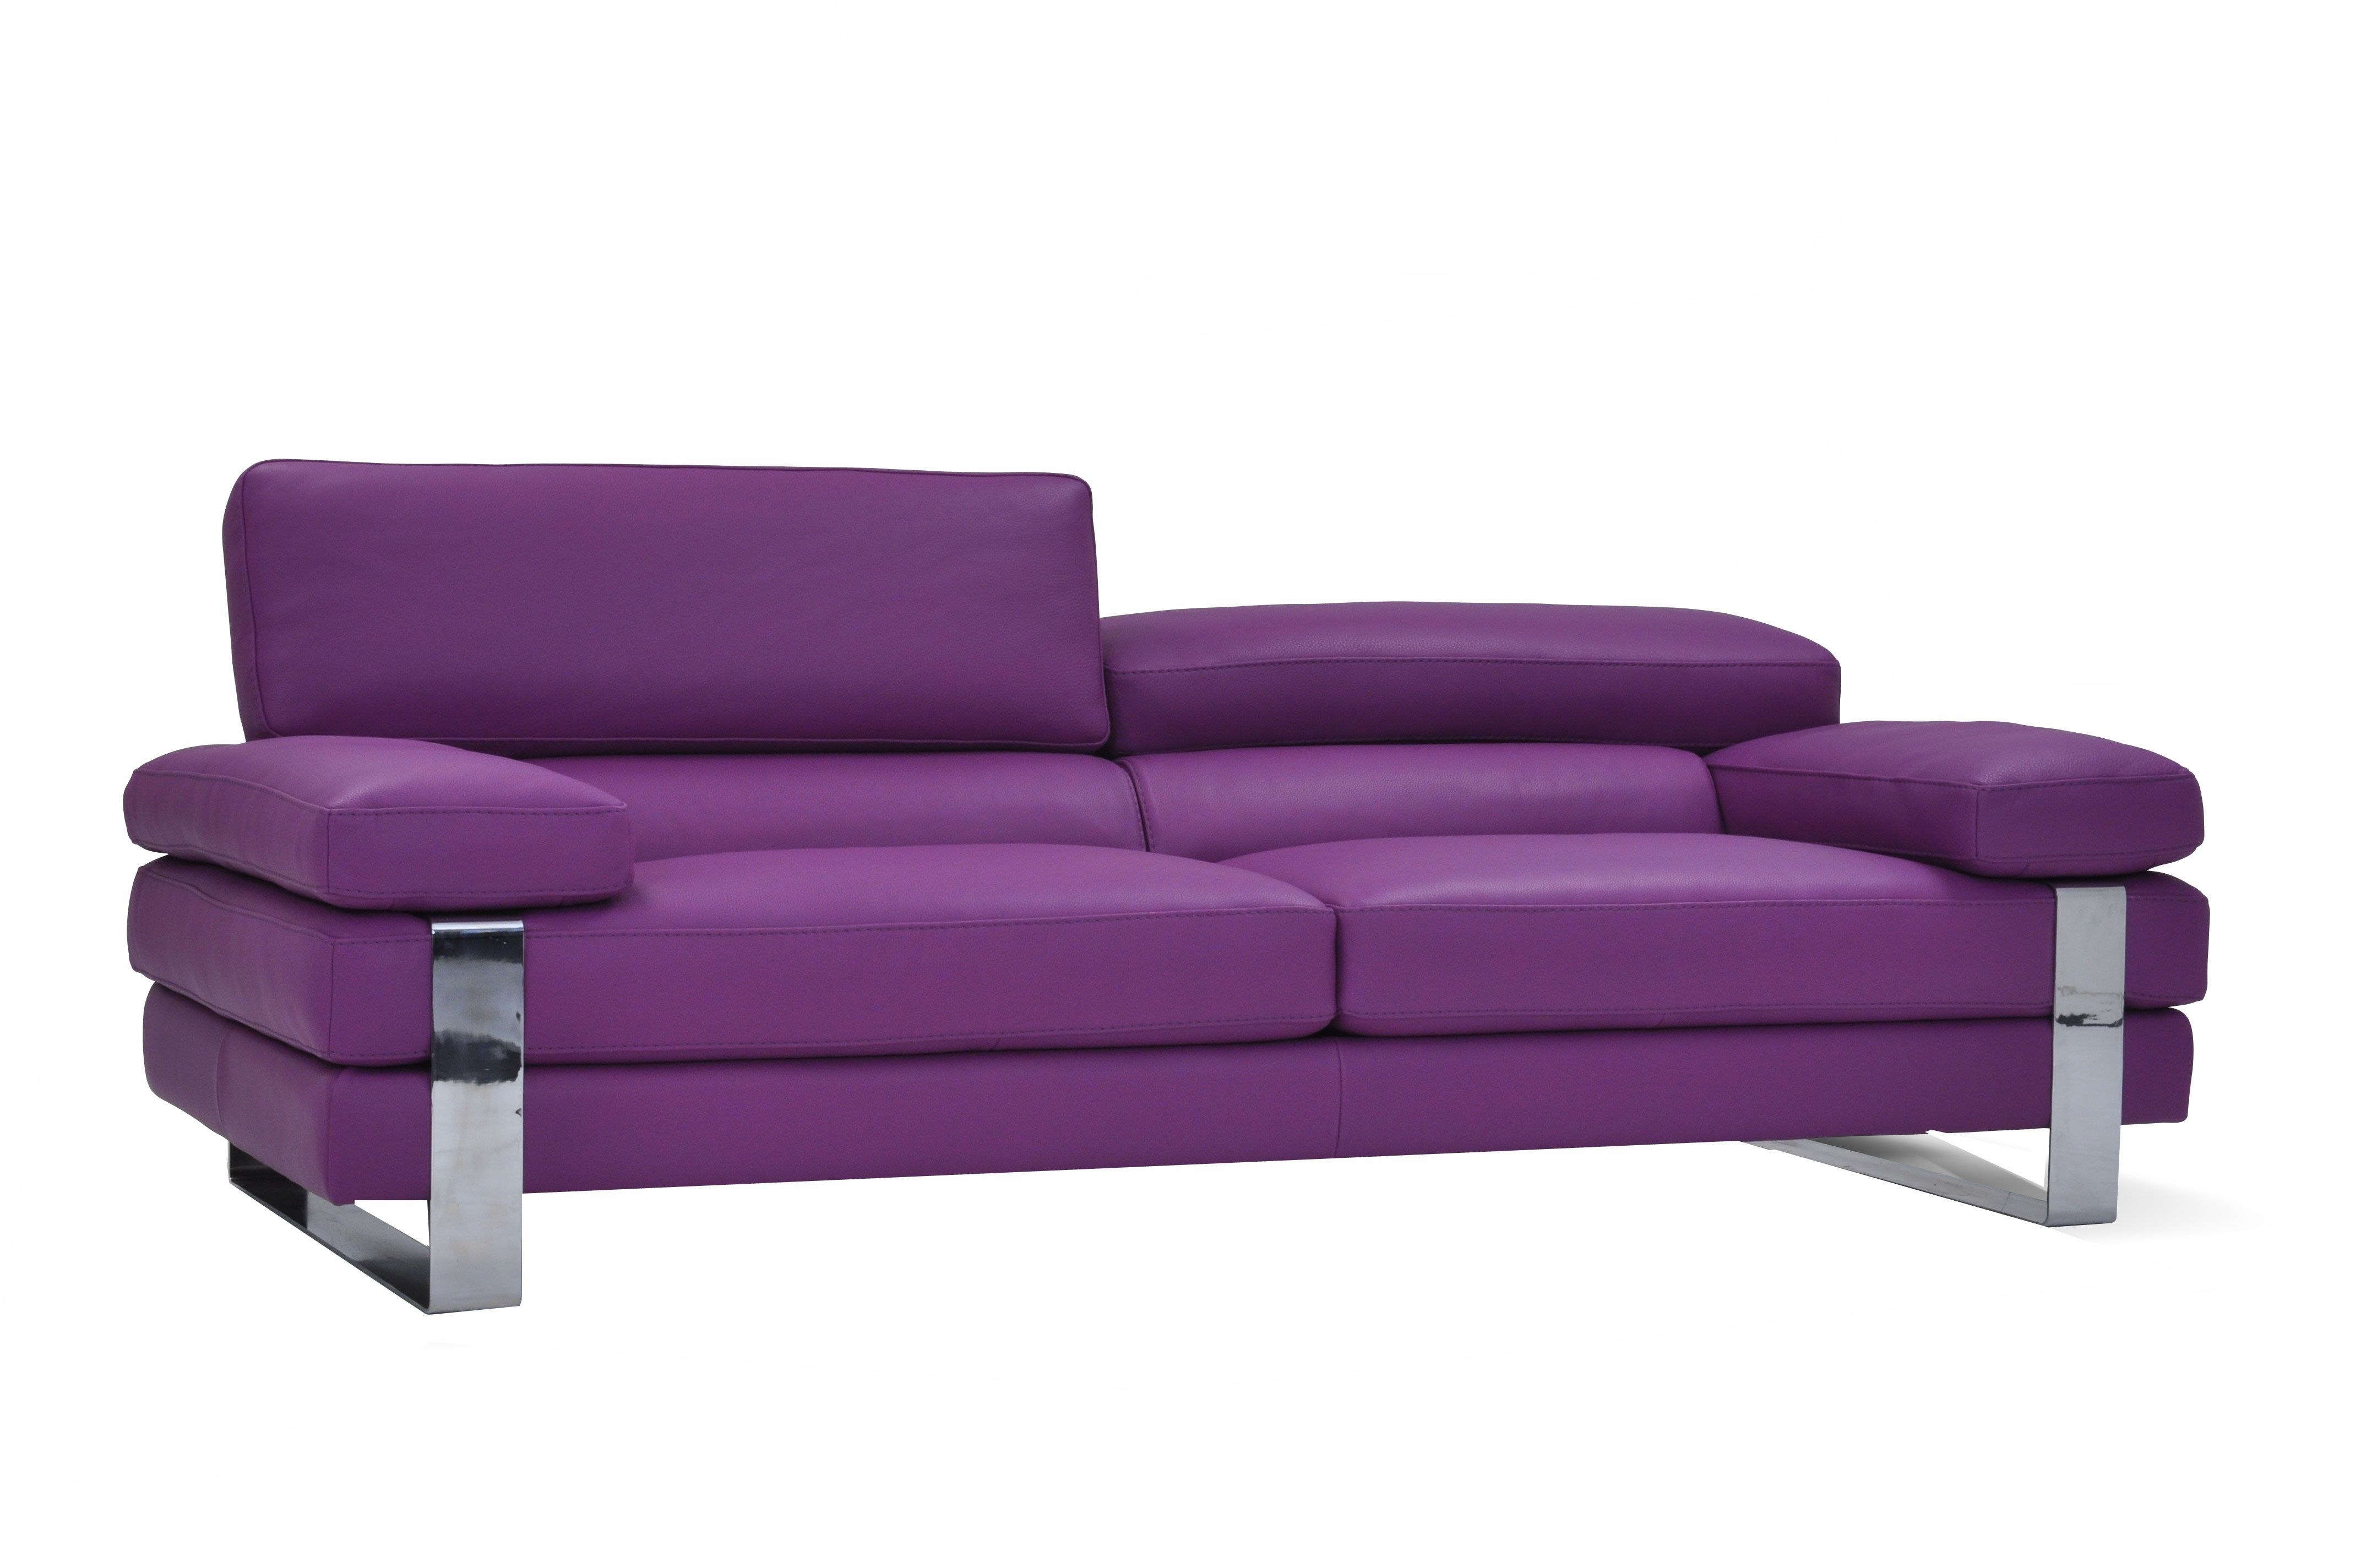 Purple Leather Sofa Made In Italy Furniture Toronto Www